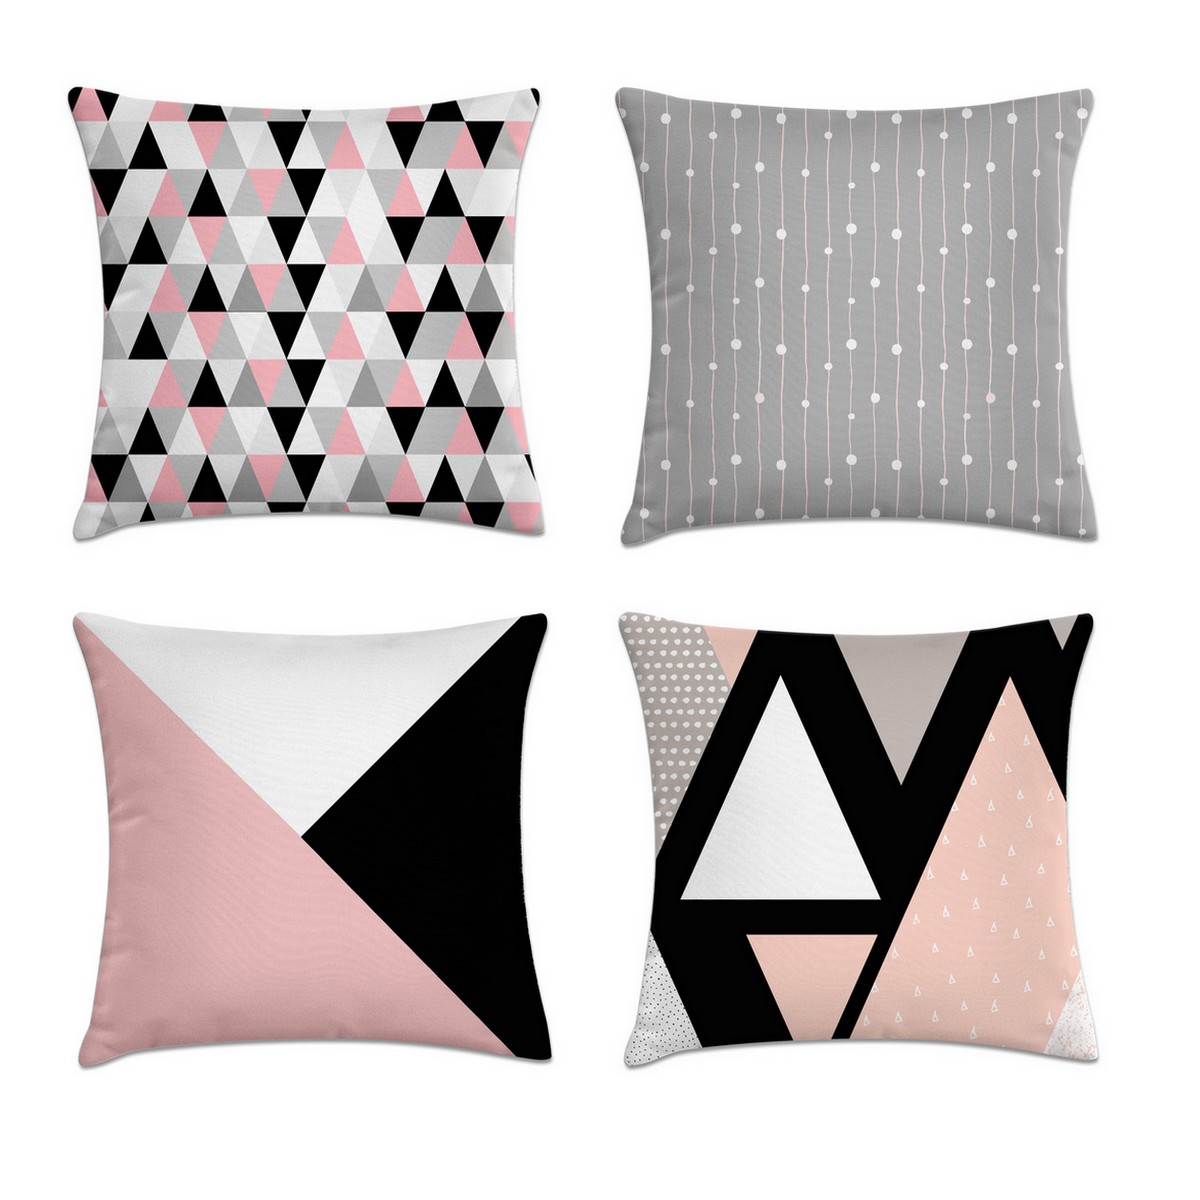 5c50c6af1 Kit 4 capas de almofada geométrica rosa preto e cinza – Kombigode Store